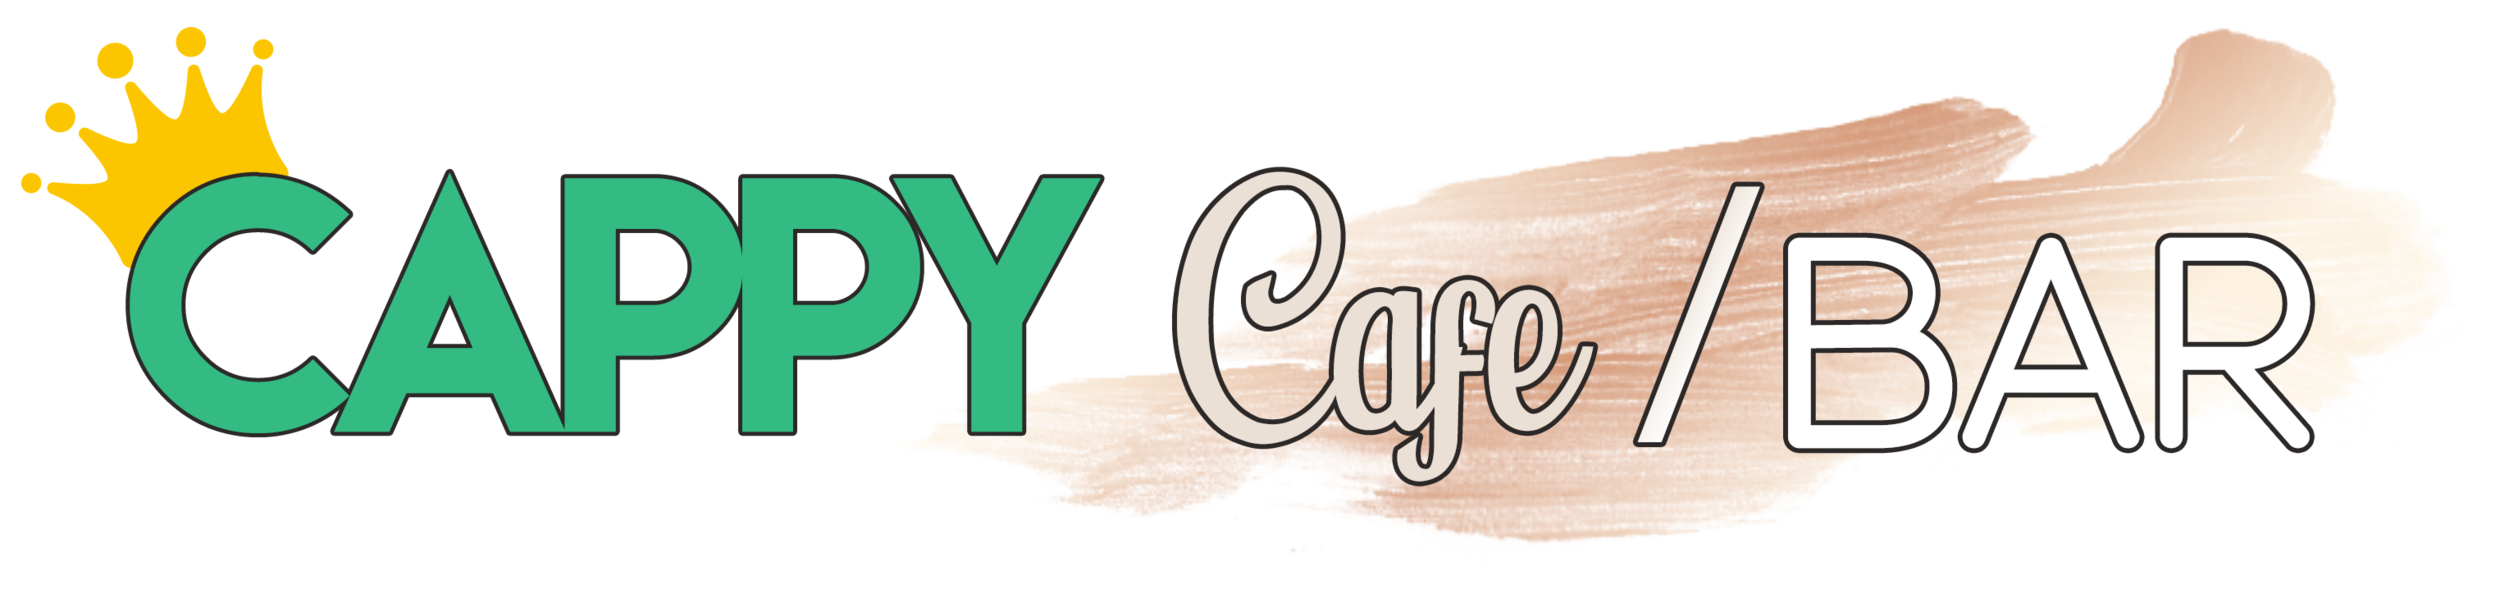 cappycafenbar.png